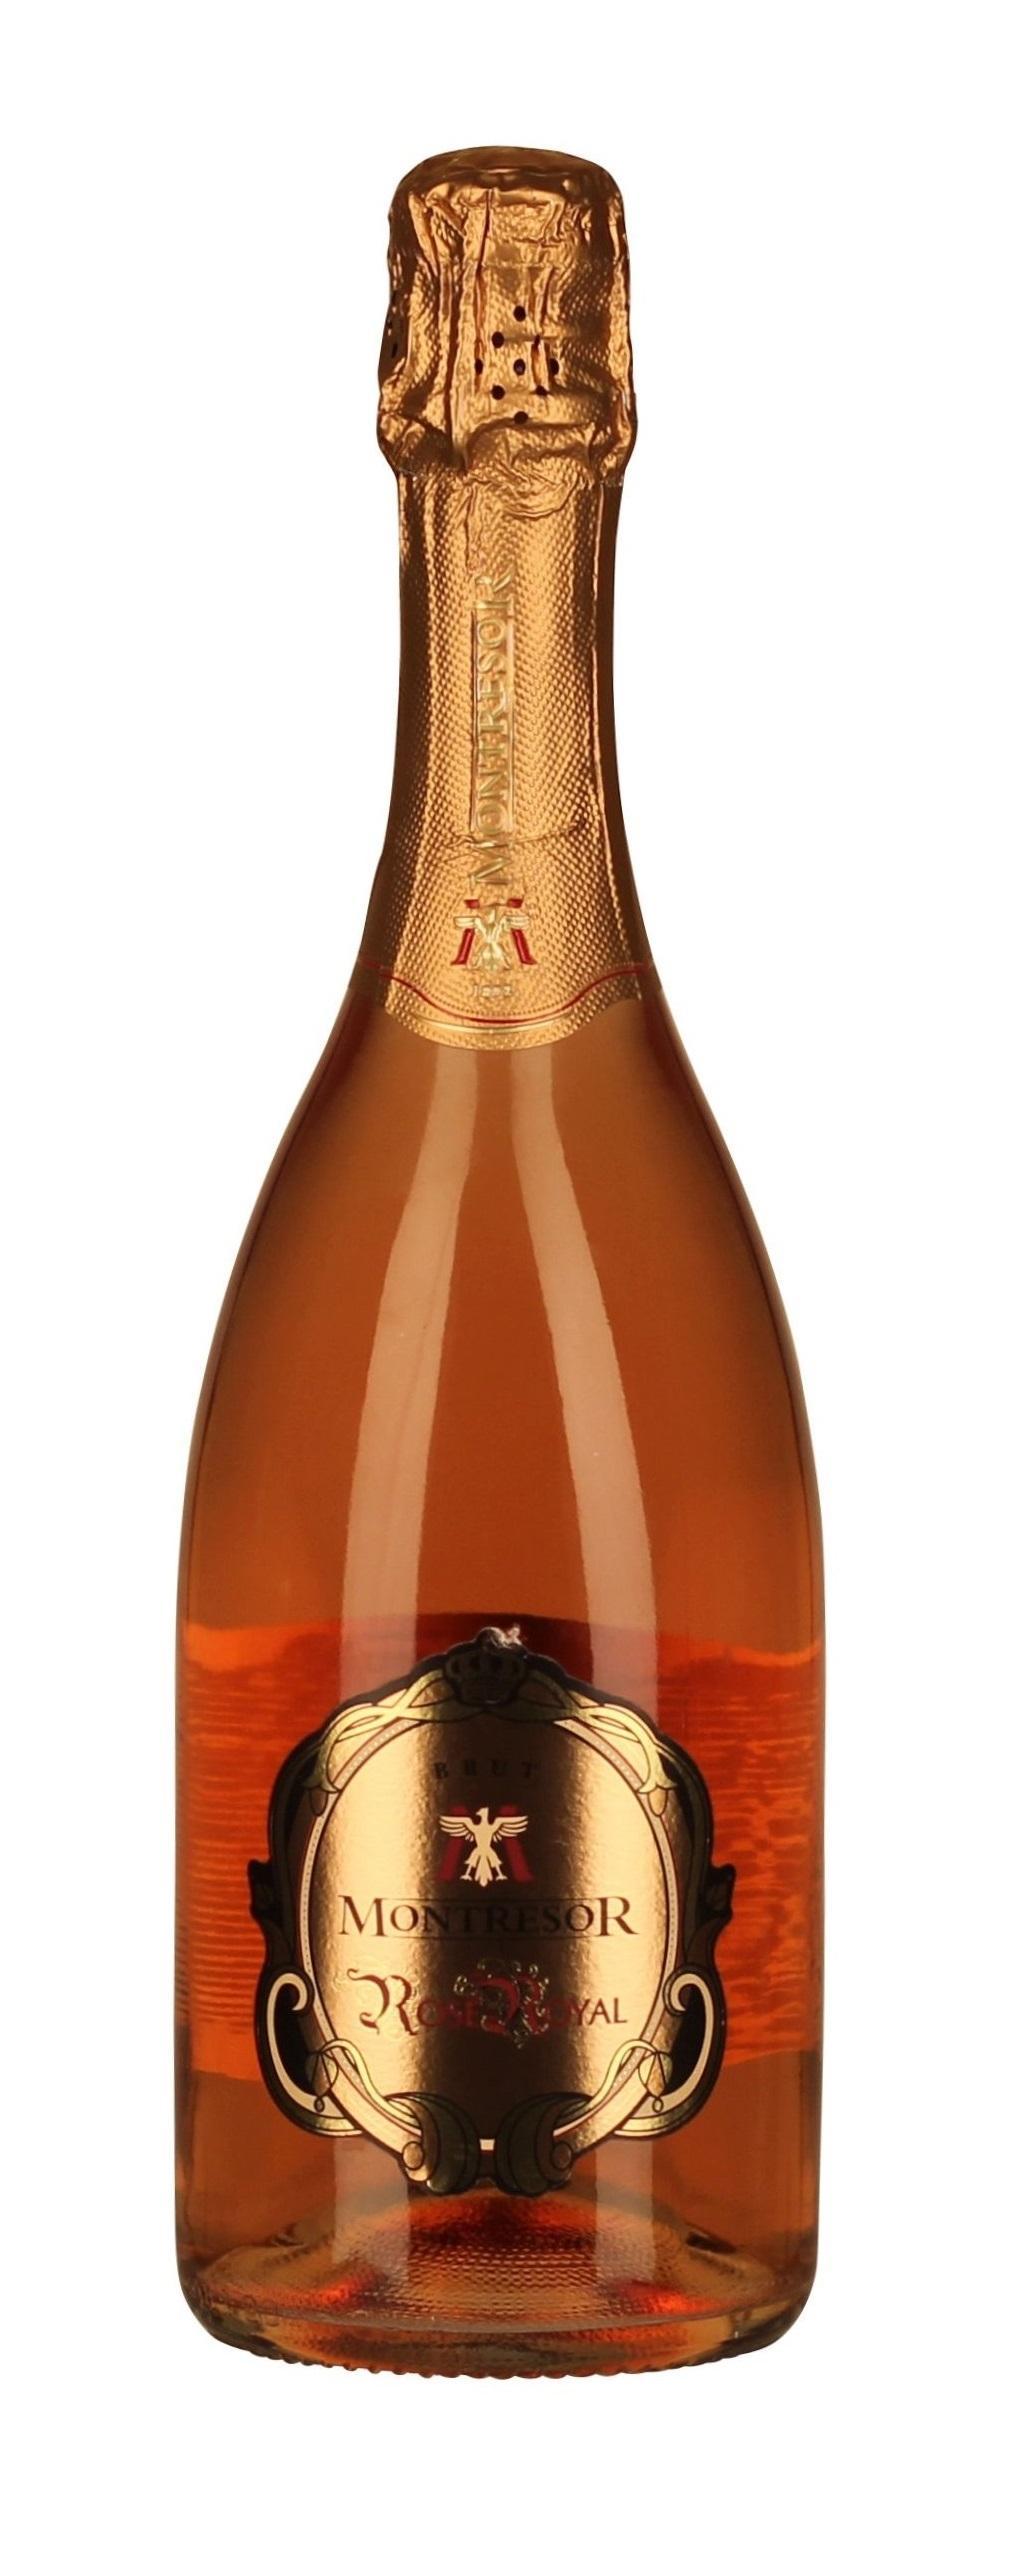 Montresor Rosé Royal Brut